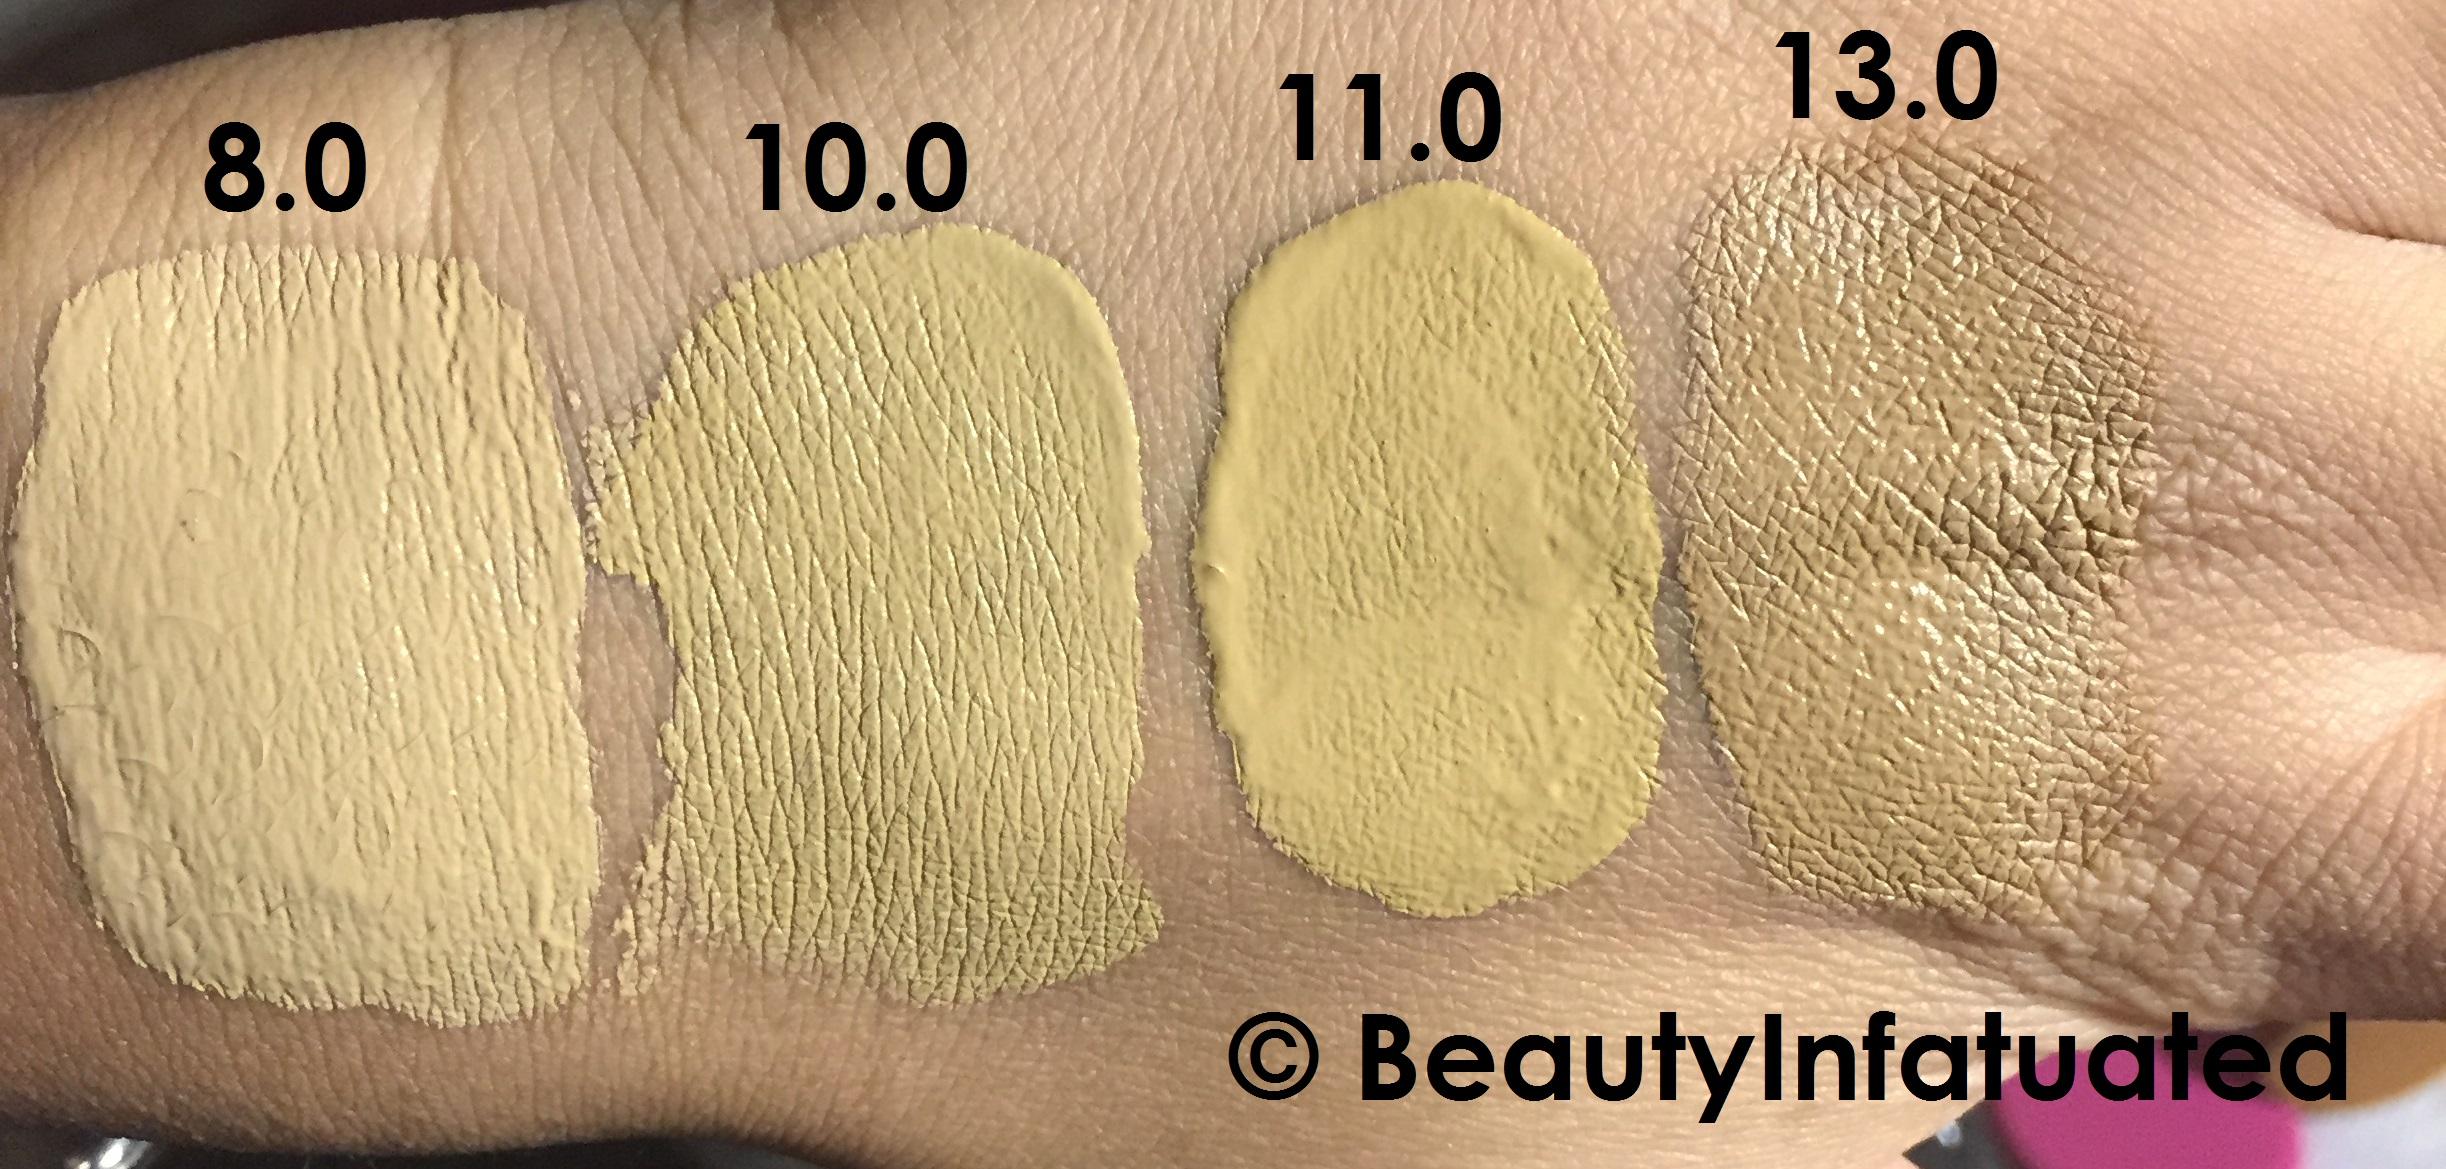 Ex1 Cosmetics Beauty Infatuated